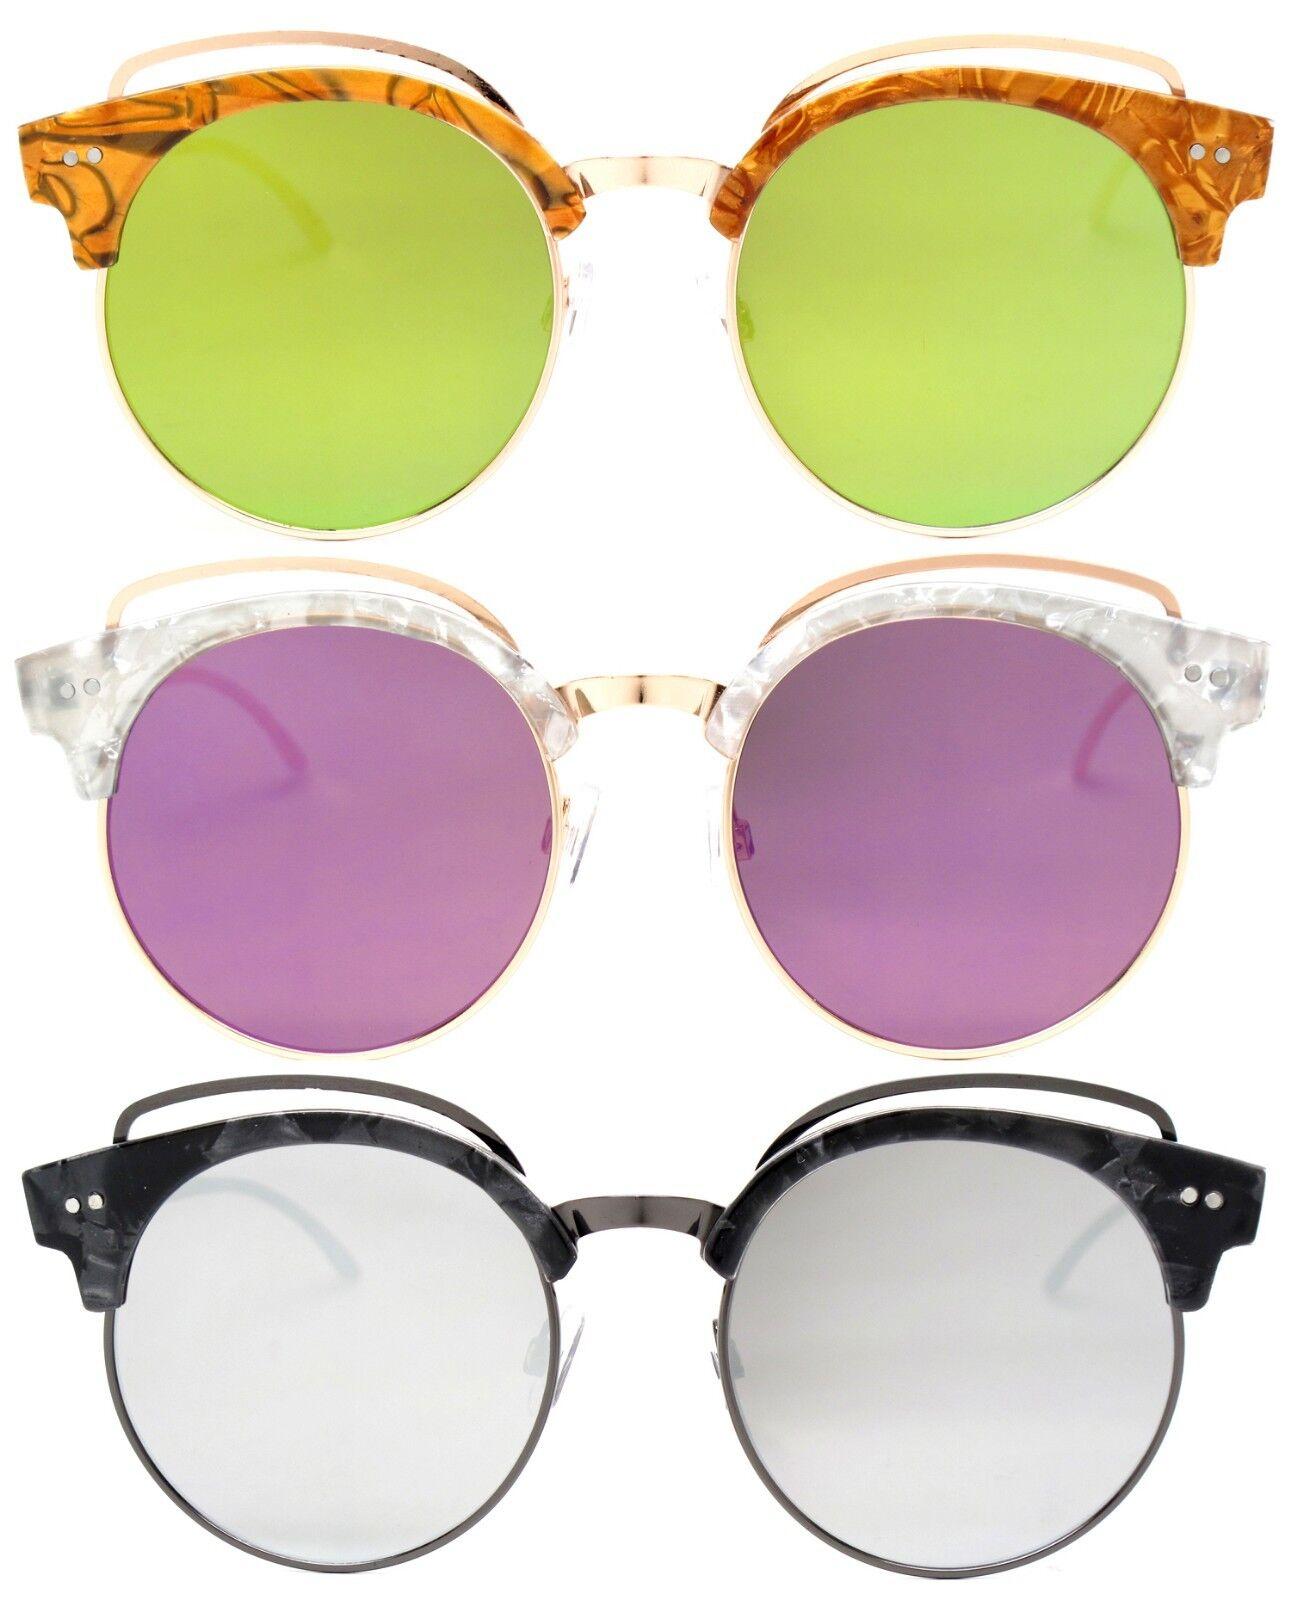 Vintage Retro Men Women Round Frame Sunglasses Glasses Eyewear